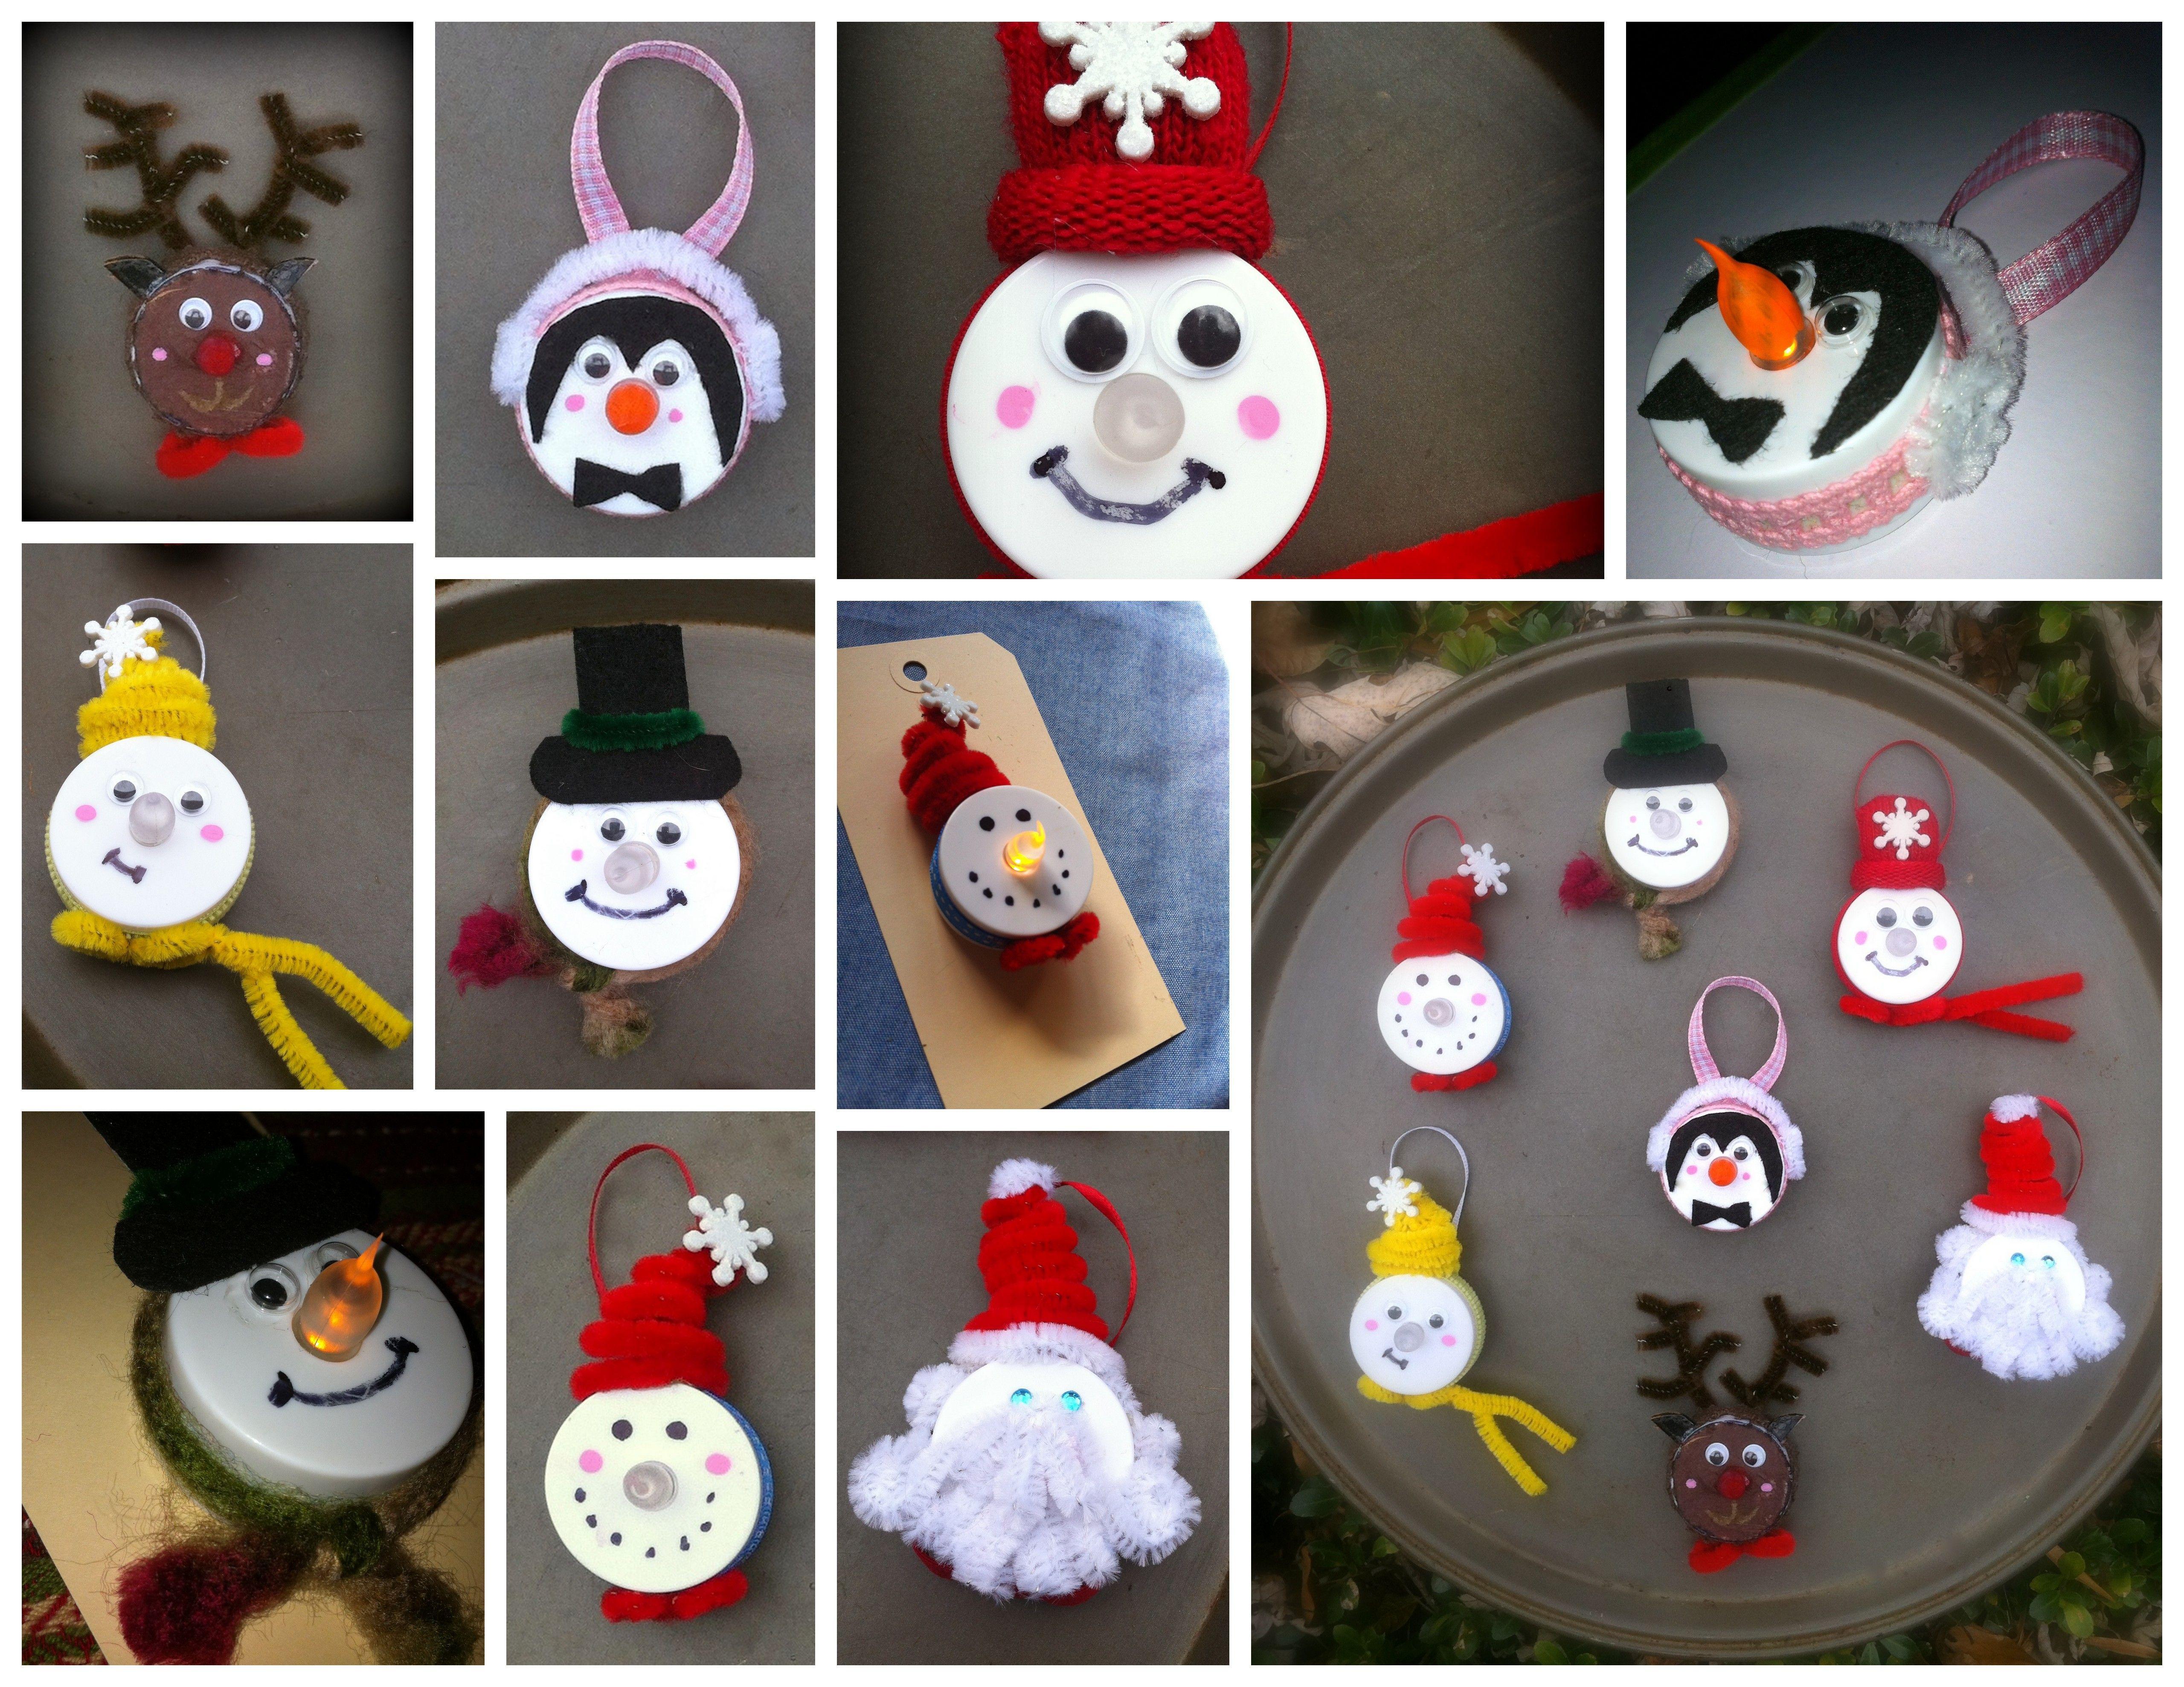 Tea Light Magnets Ornaments Christmas Ornament Crafts Tea Light Crafts Xmas Crafts